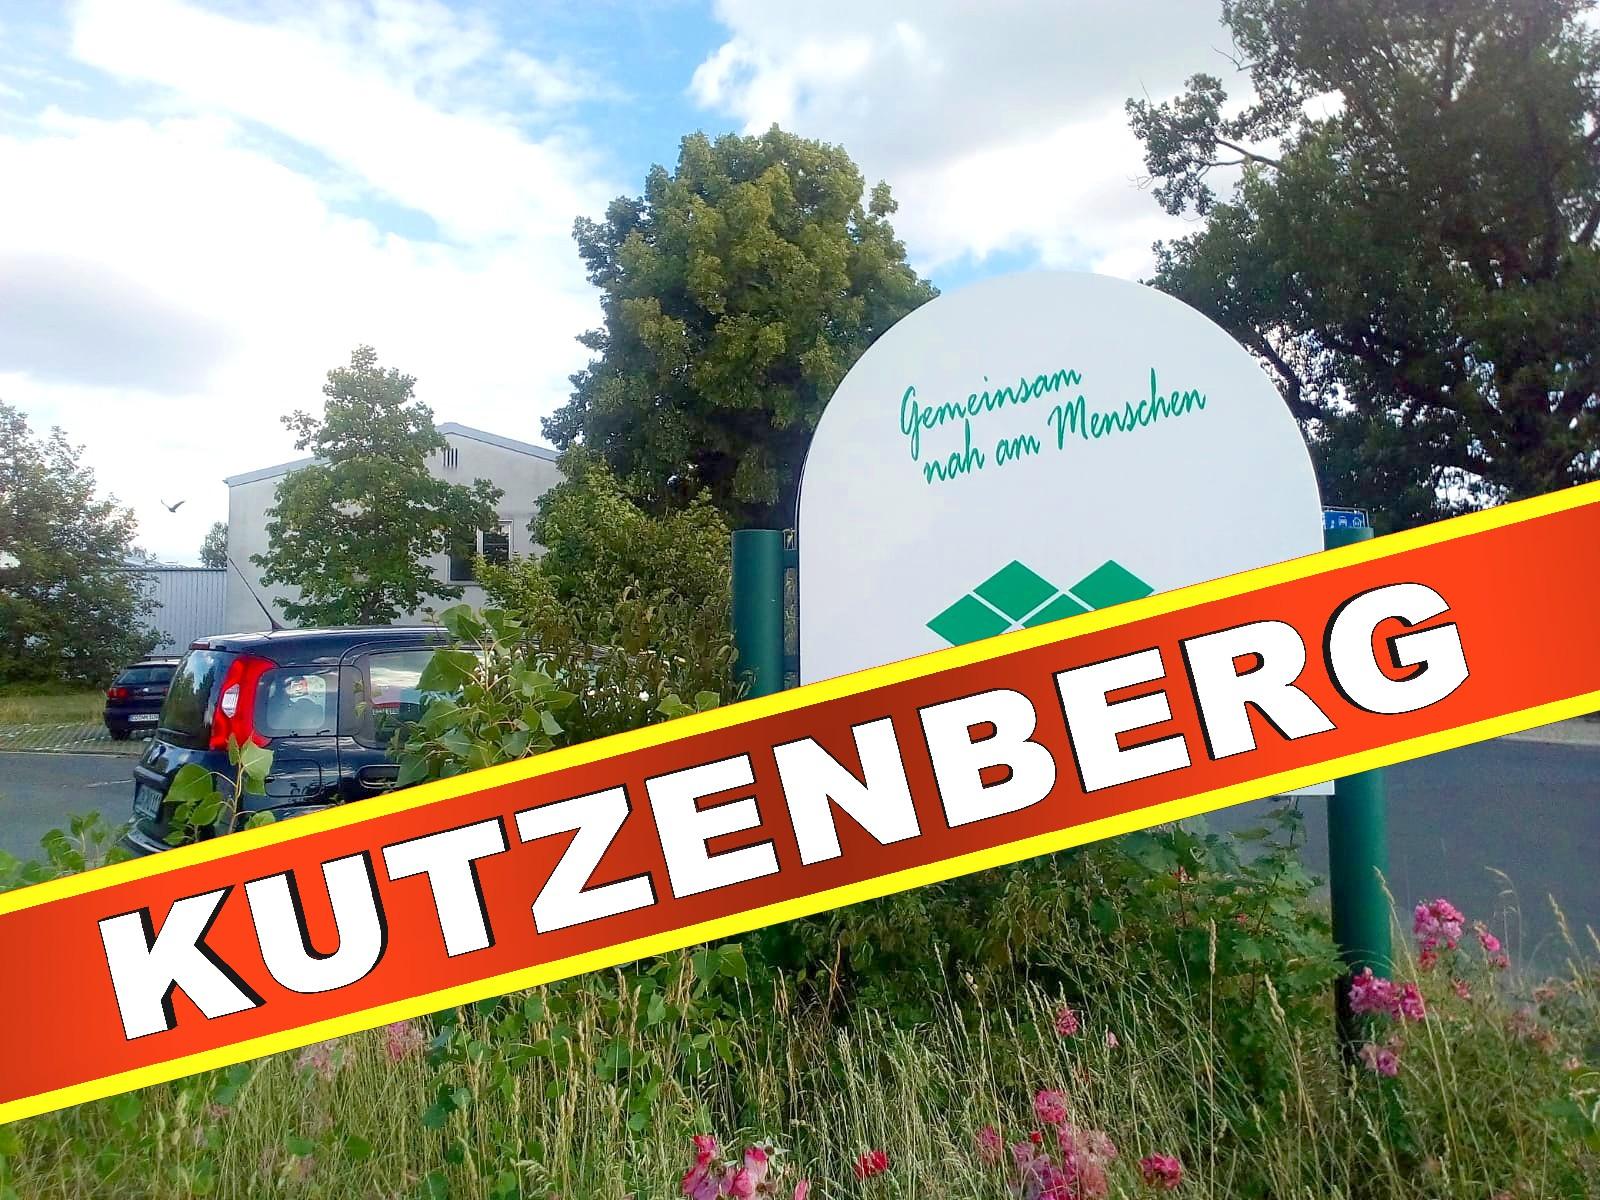 Bezirksklinikum Obermain Kutzenberg, 96250 Ebensfeld Psychiatrie Polizei Krankenhaus (39)